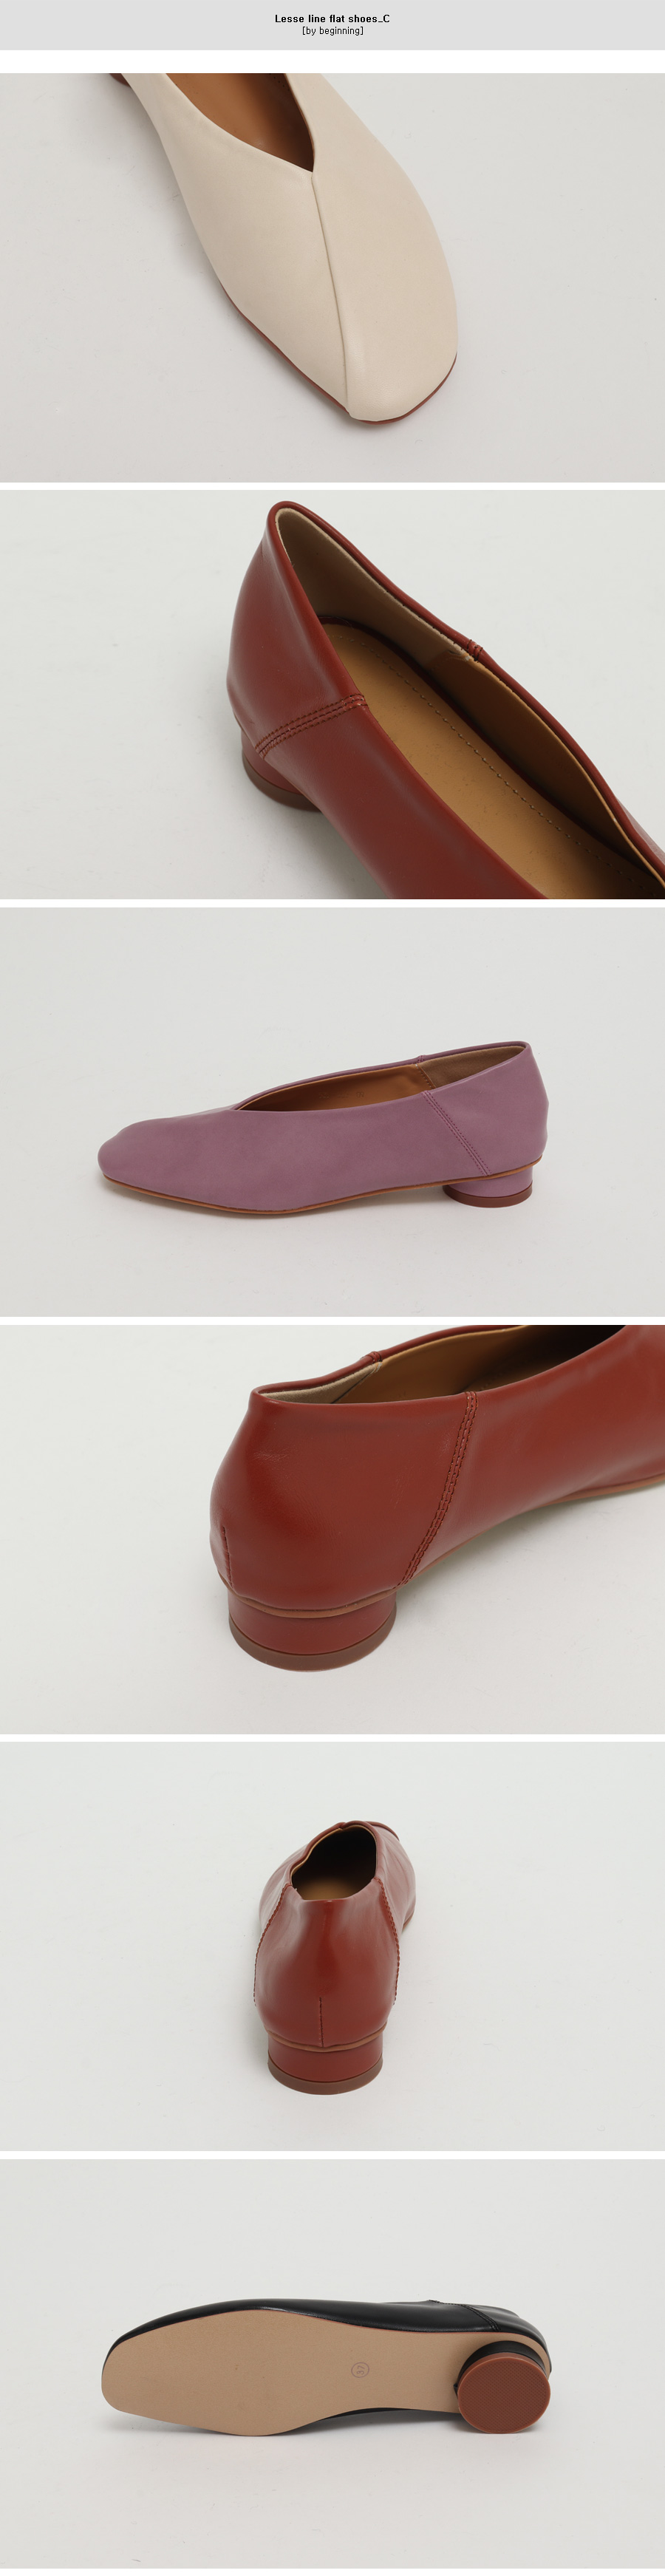 Lesse line flat shoes_C